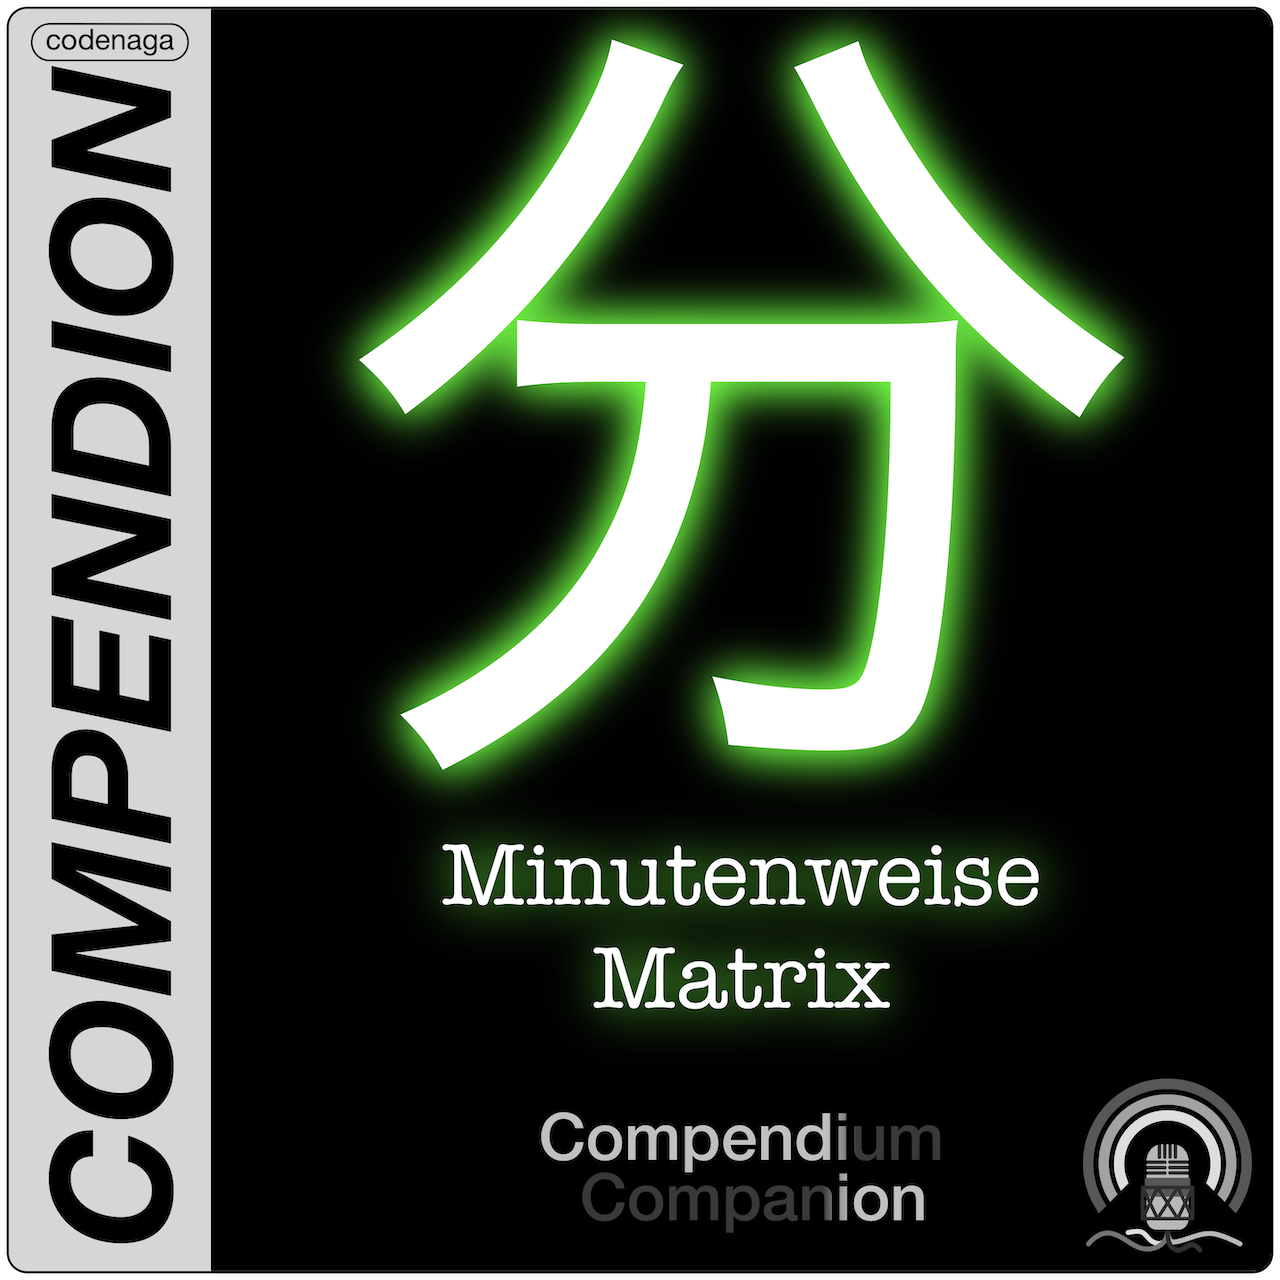 Minutenweise Matrix Logo 1280